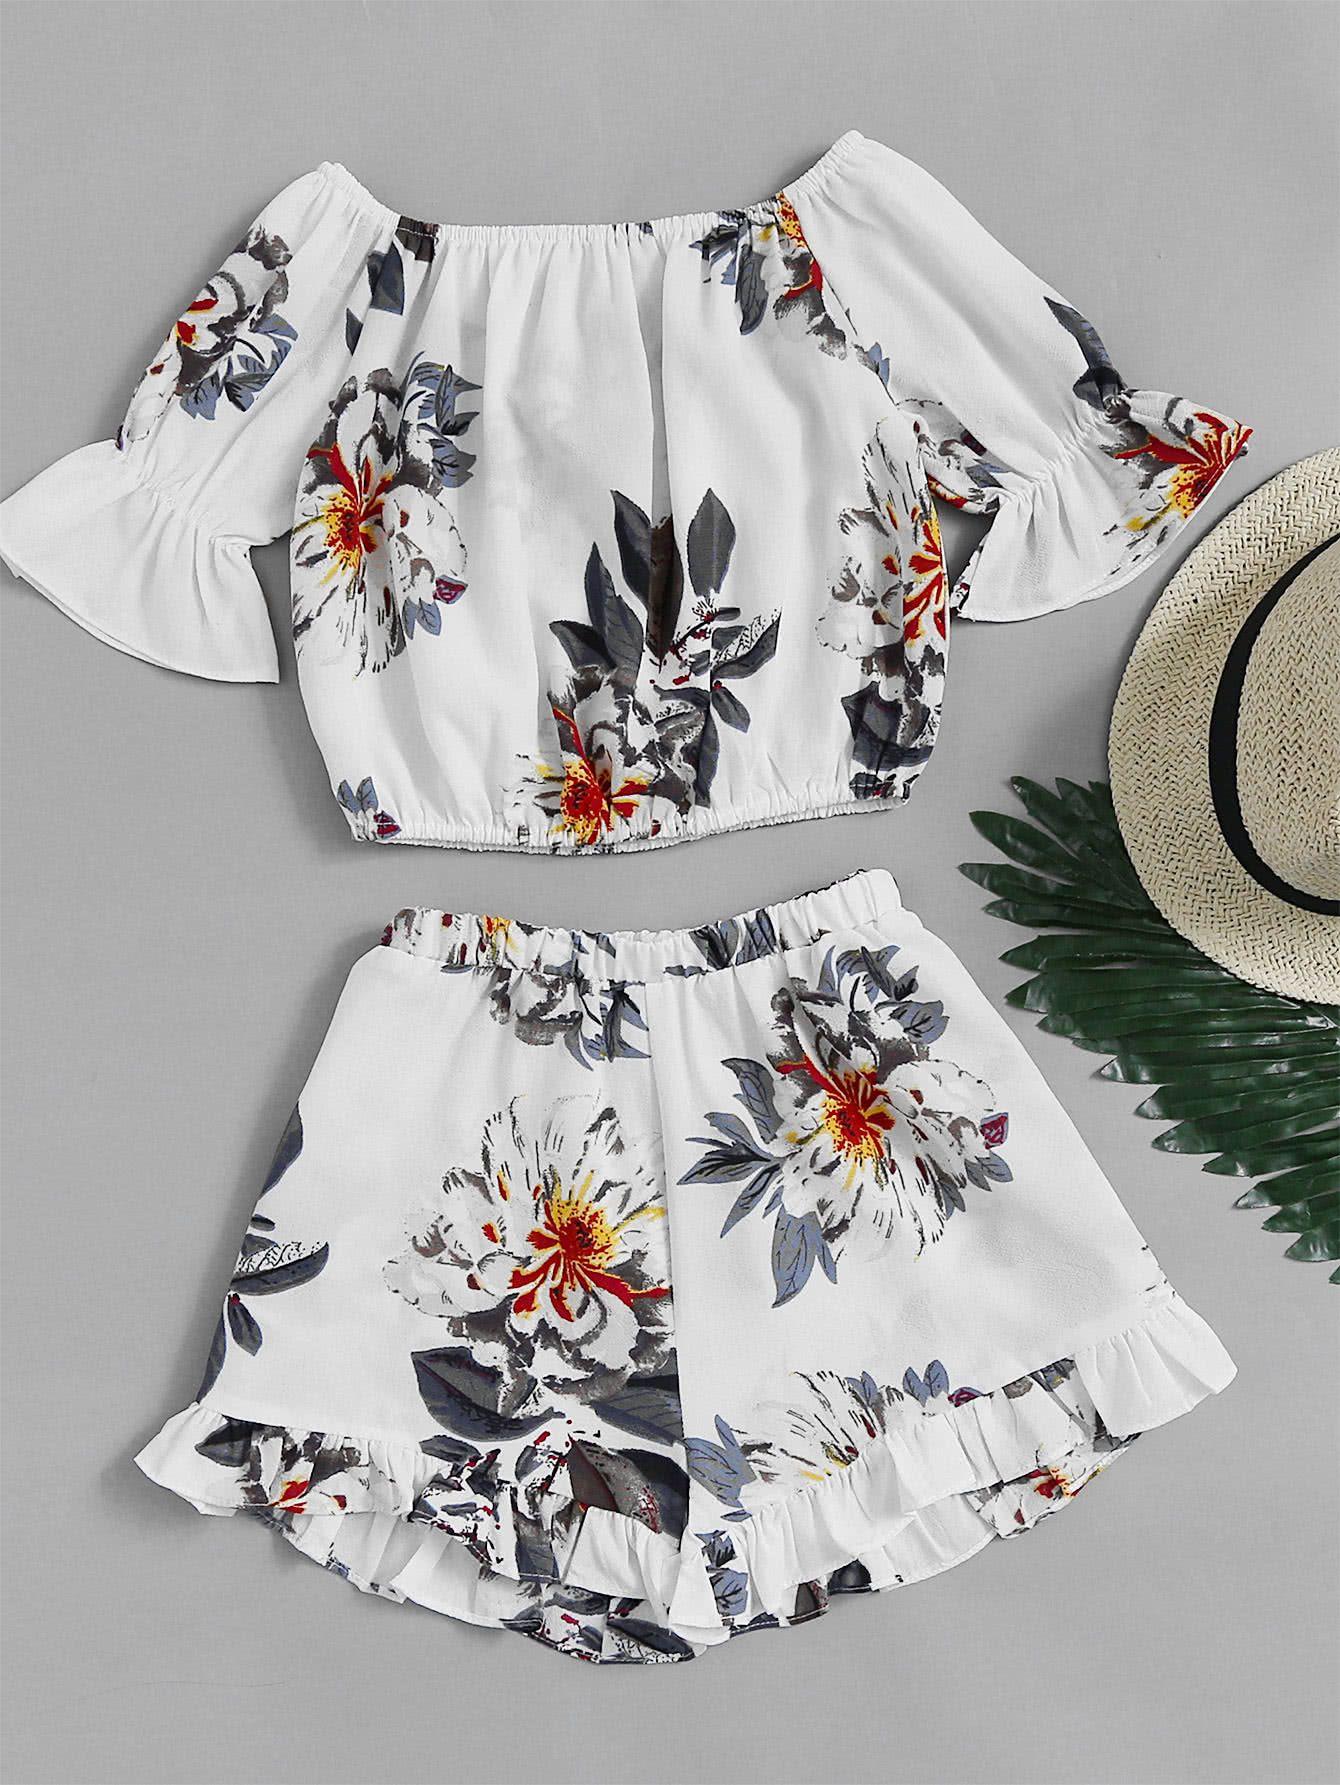 bfa1b23a3f Bardot Florals Crop Top With Frill Hem Shorts -SheIn(Sheinside ...